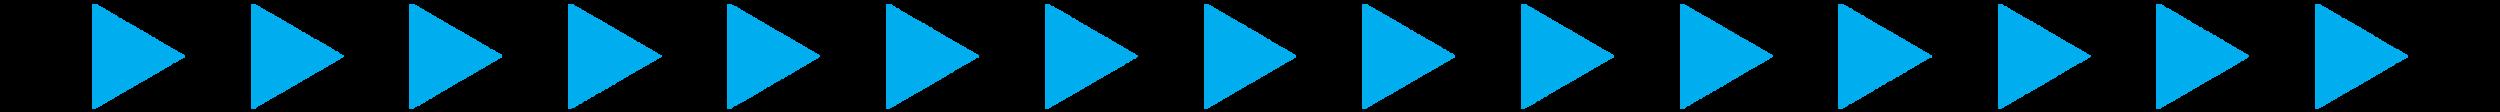 NextMuncie_arrows.png